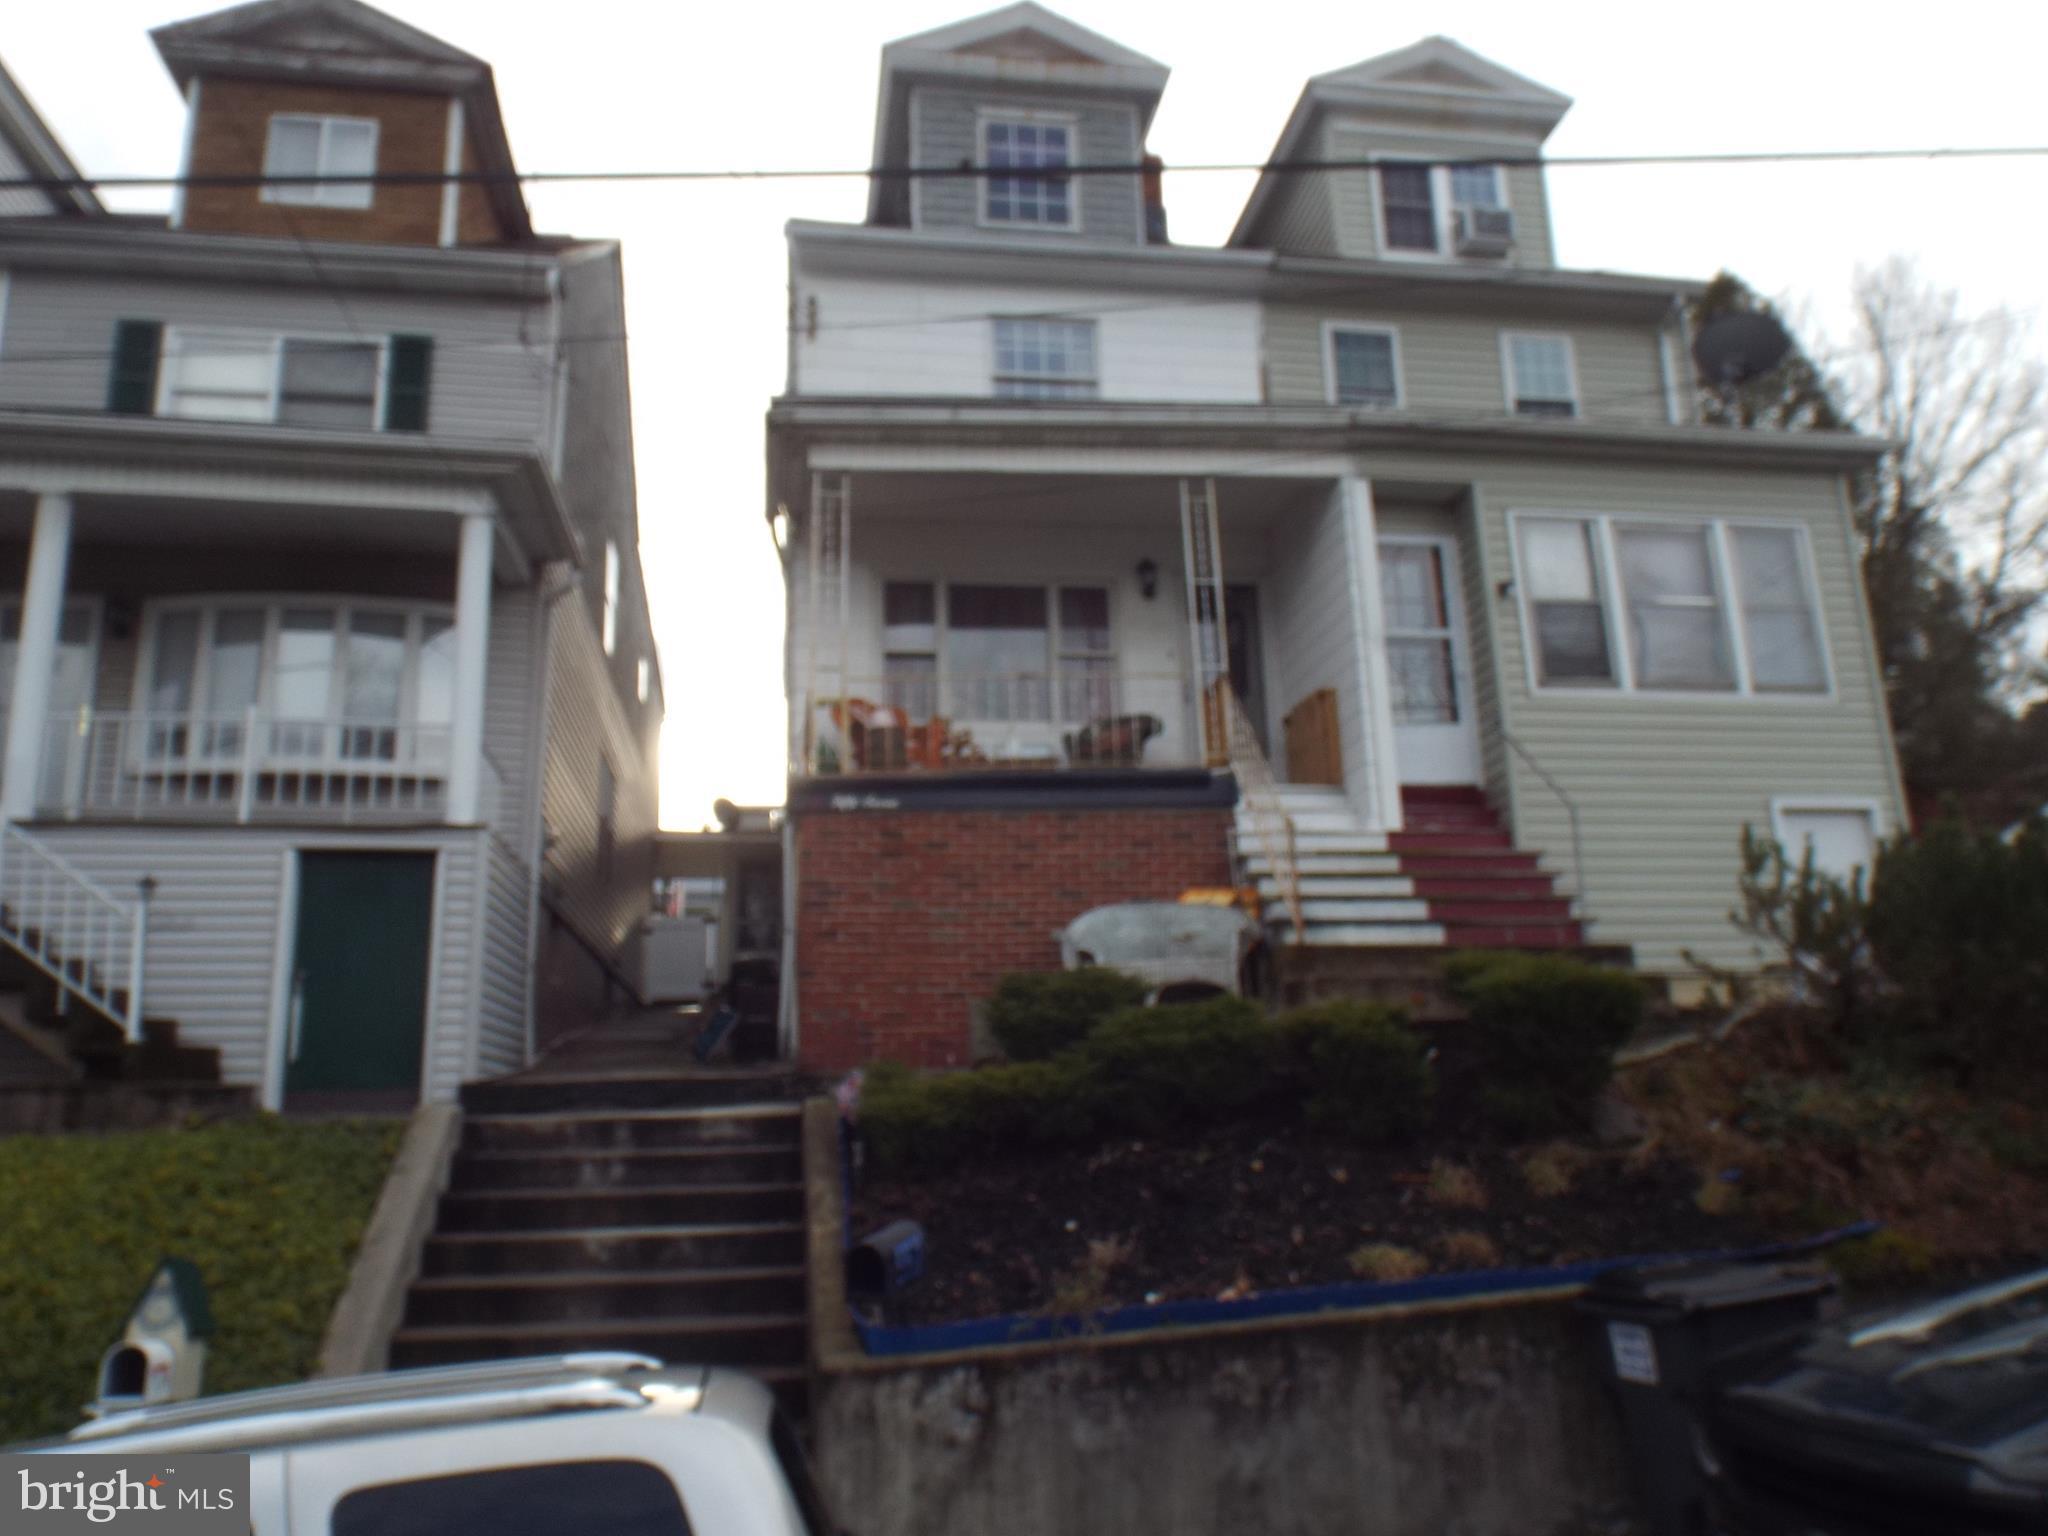 657 PINE HILL STREET, MINERSVILLE, PA 17954